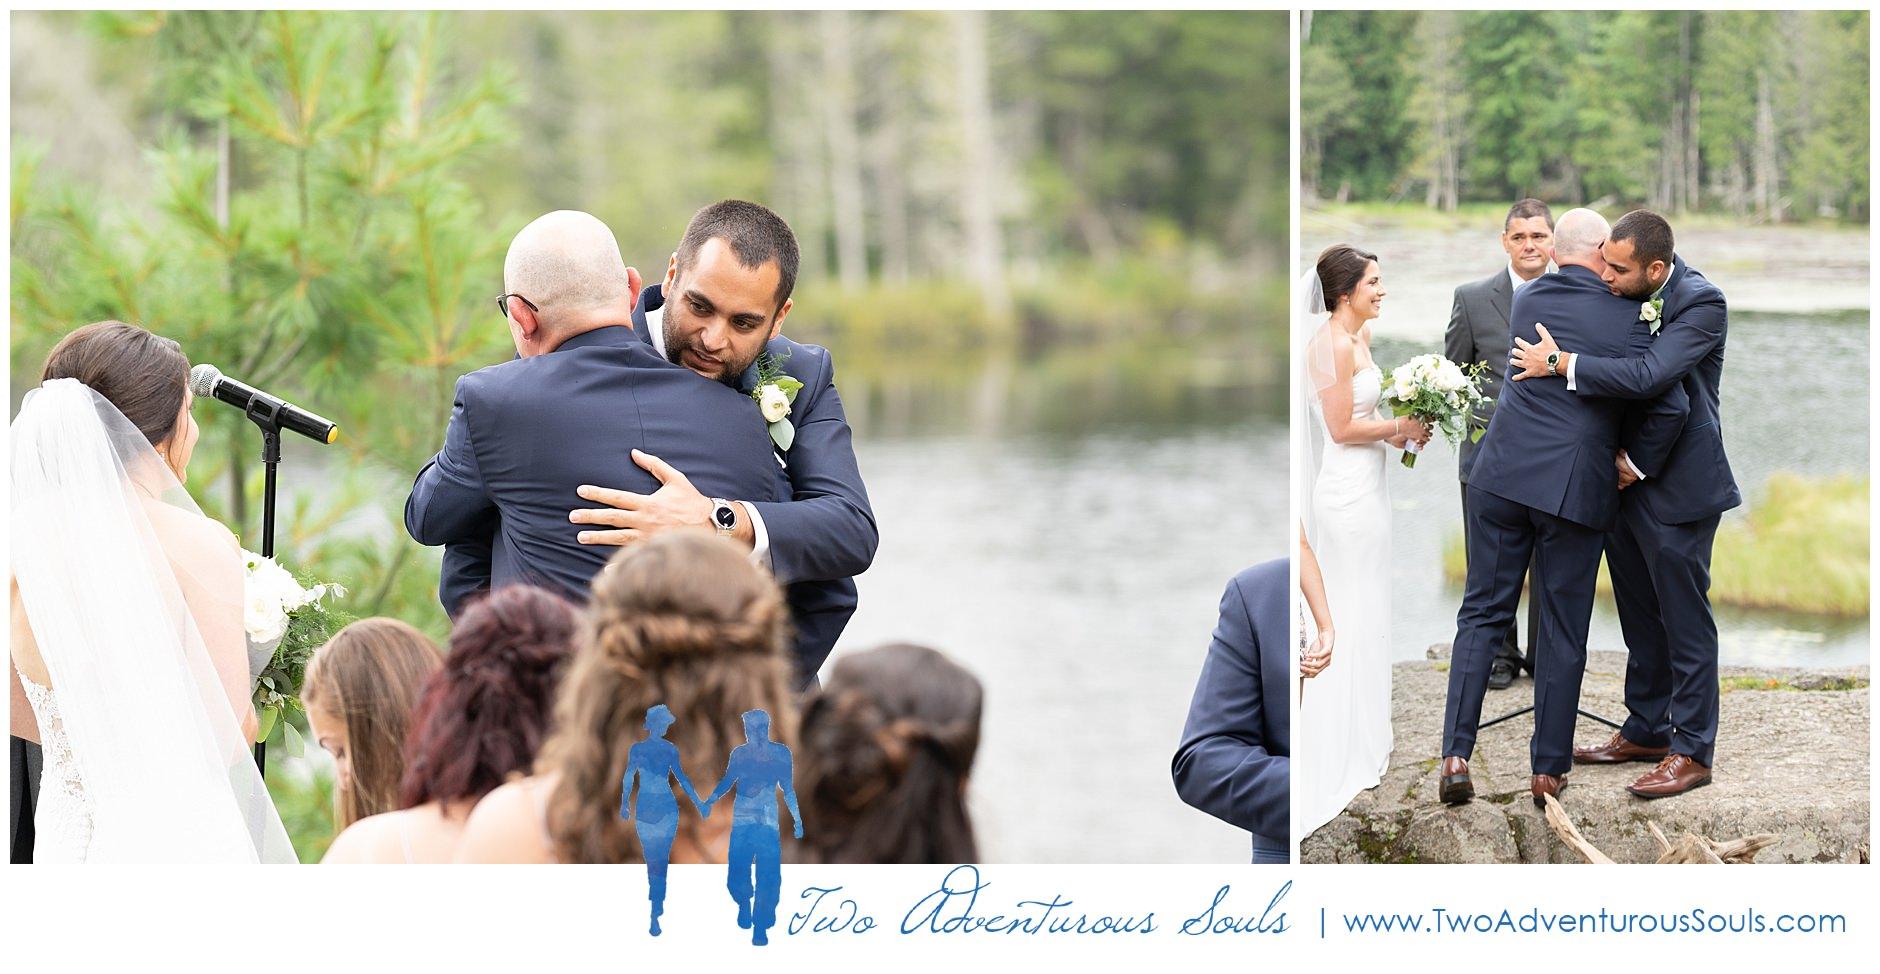 Sugarloaf Outdoor Center Wedding Photographers, Destination Wedding Photographers, Two Adventurous Souls-081719_0034.jpg